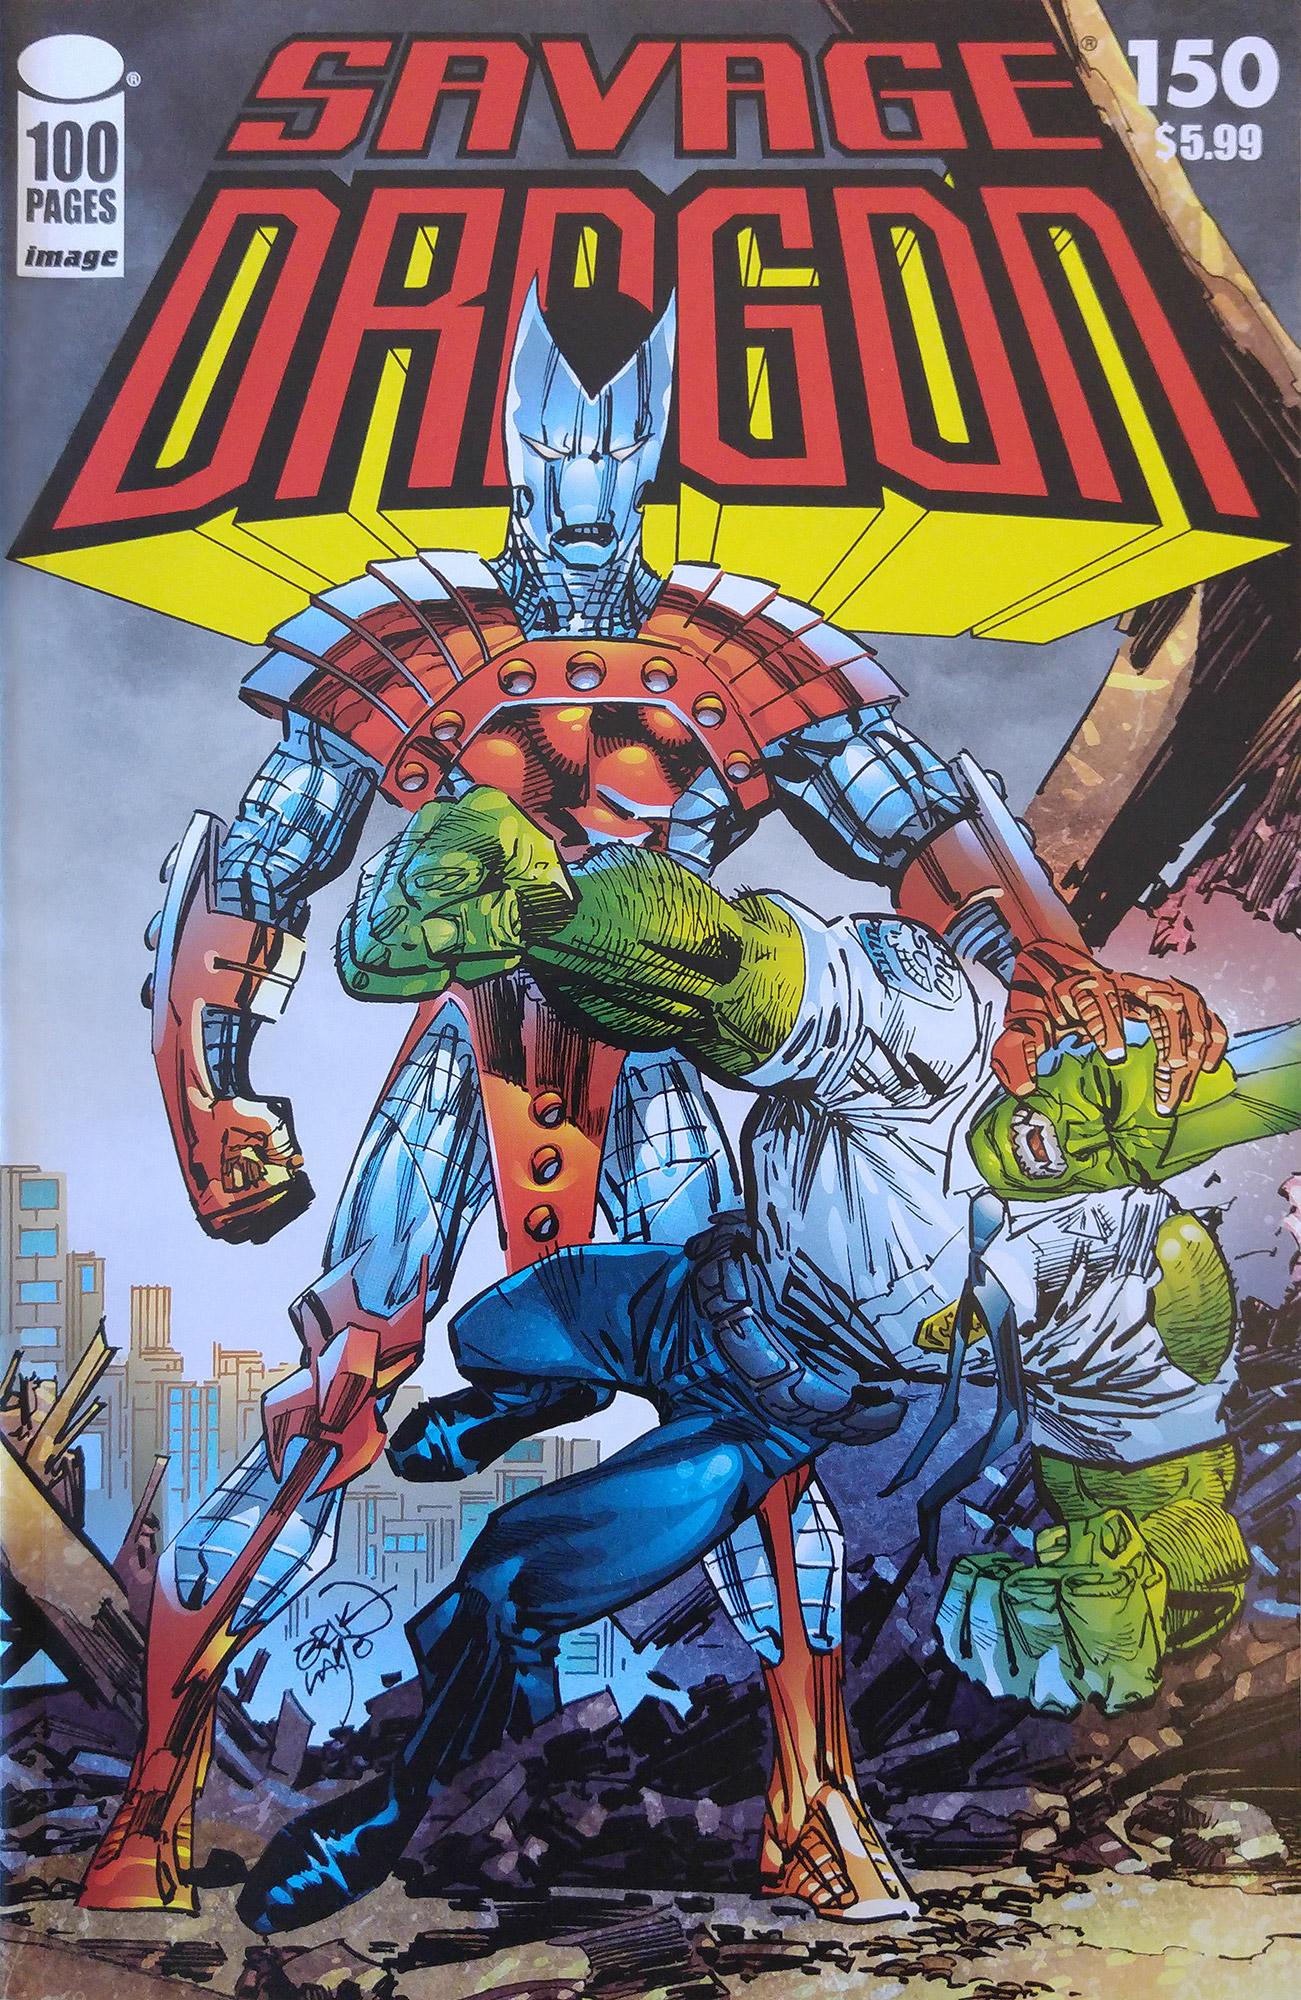 Cover Savage Dragon Vol.2 #150